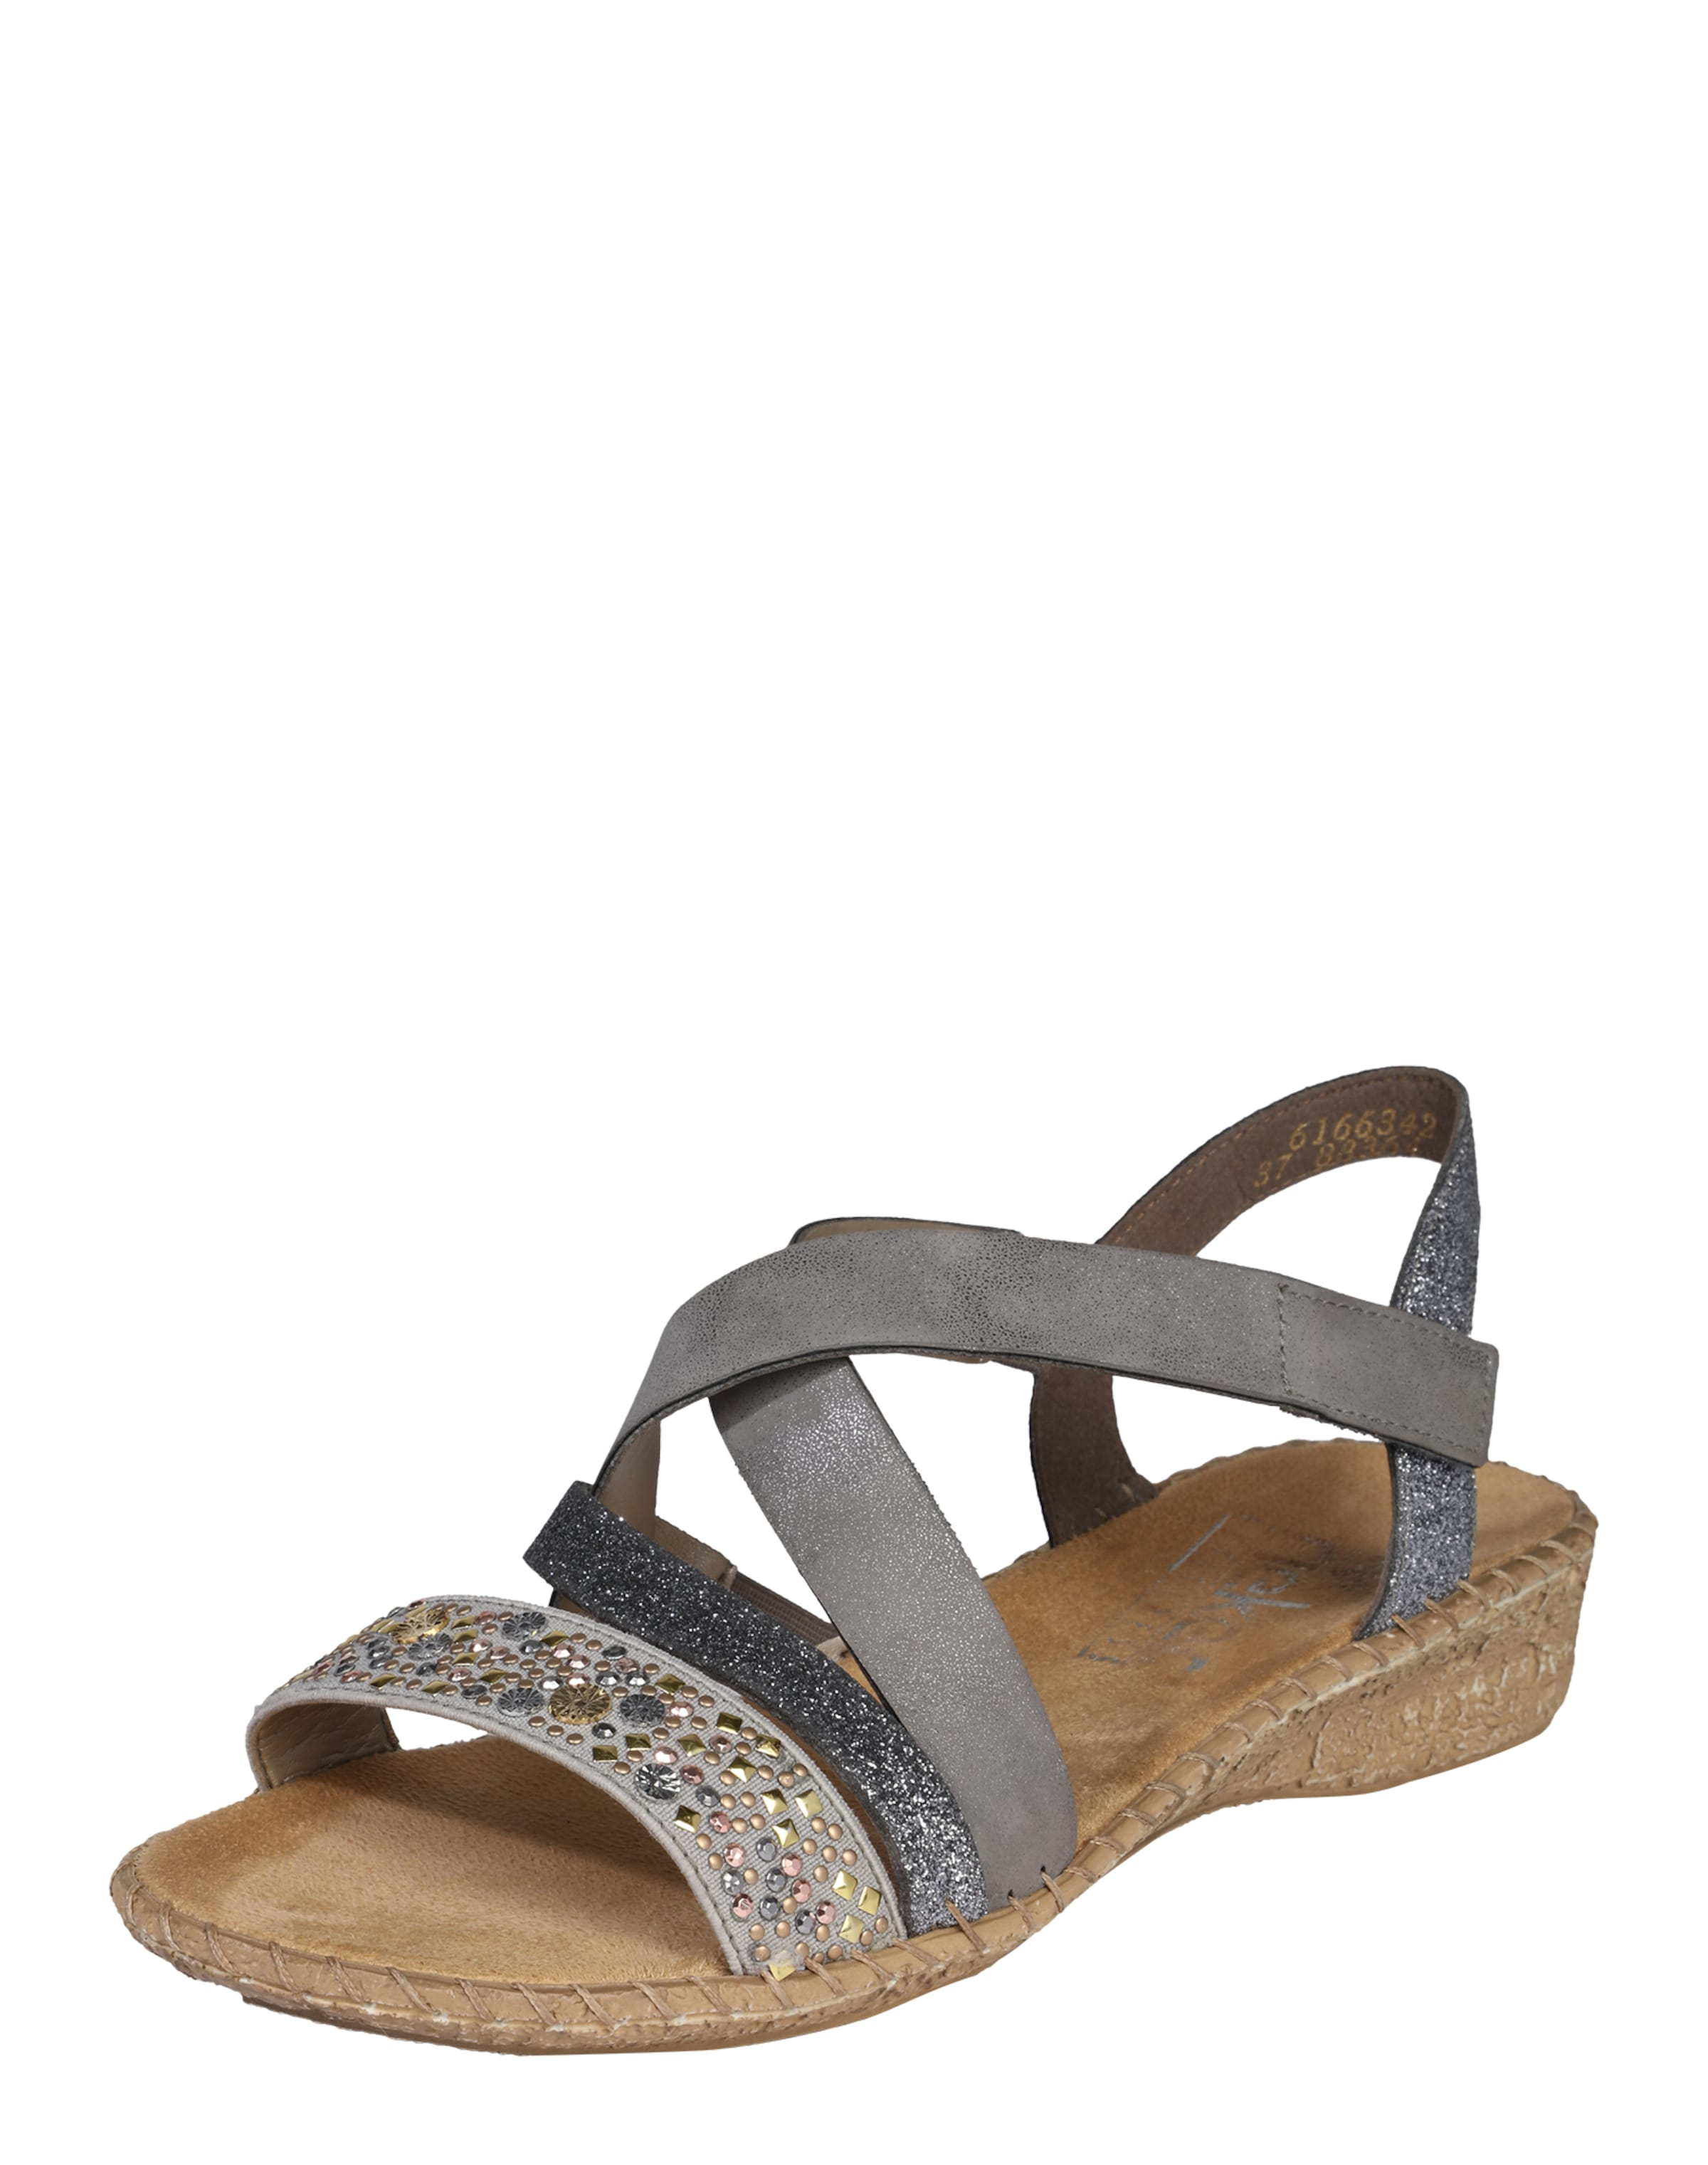 RIEKER Sandalen mit Nietenbesatz Cross Hohe Qualität